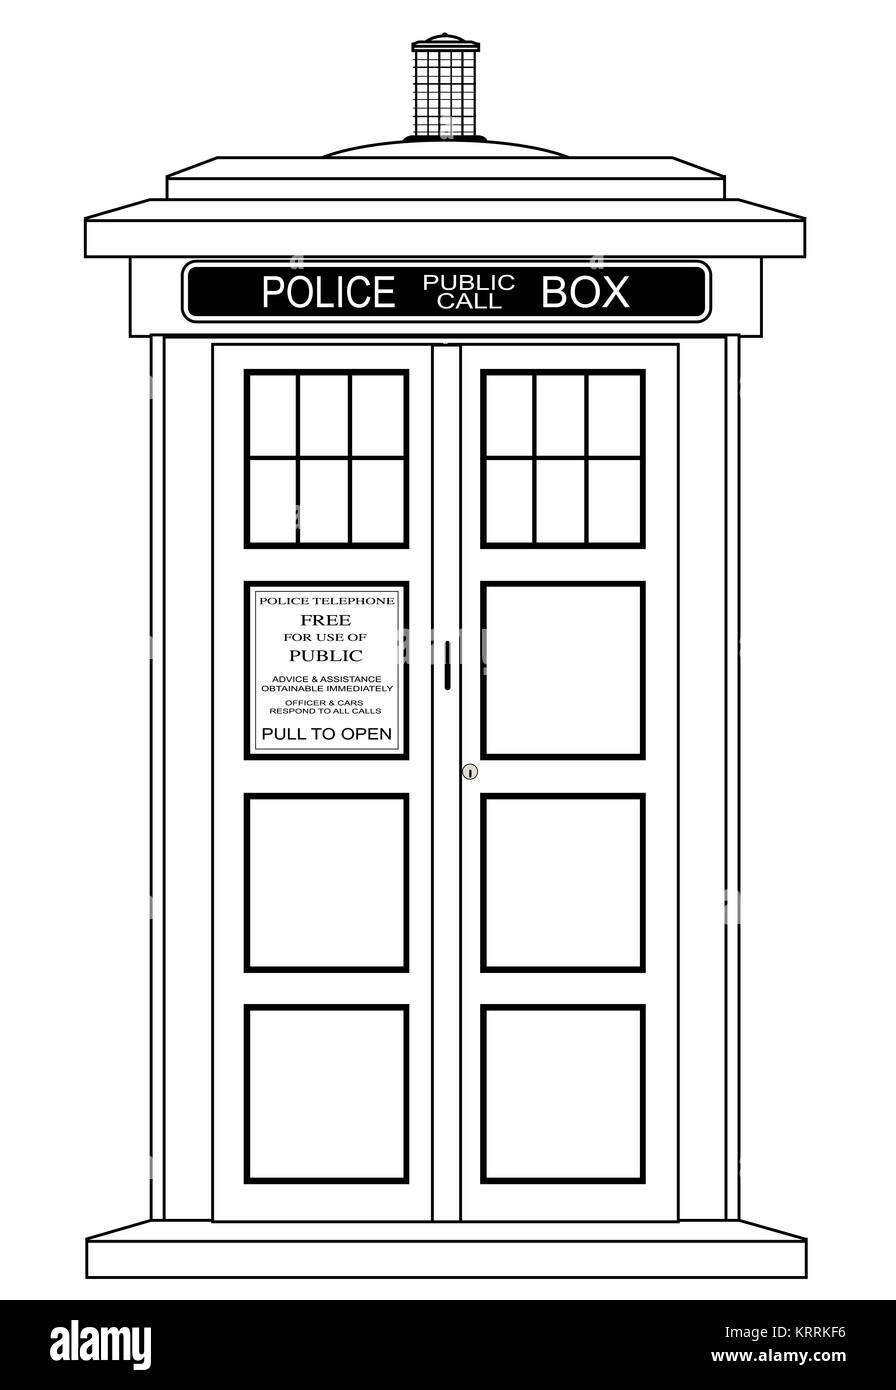 Old Fashioned British Police Box - Stock Image